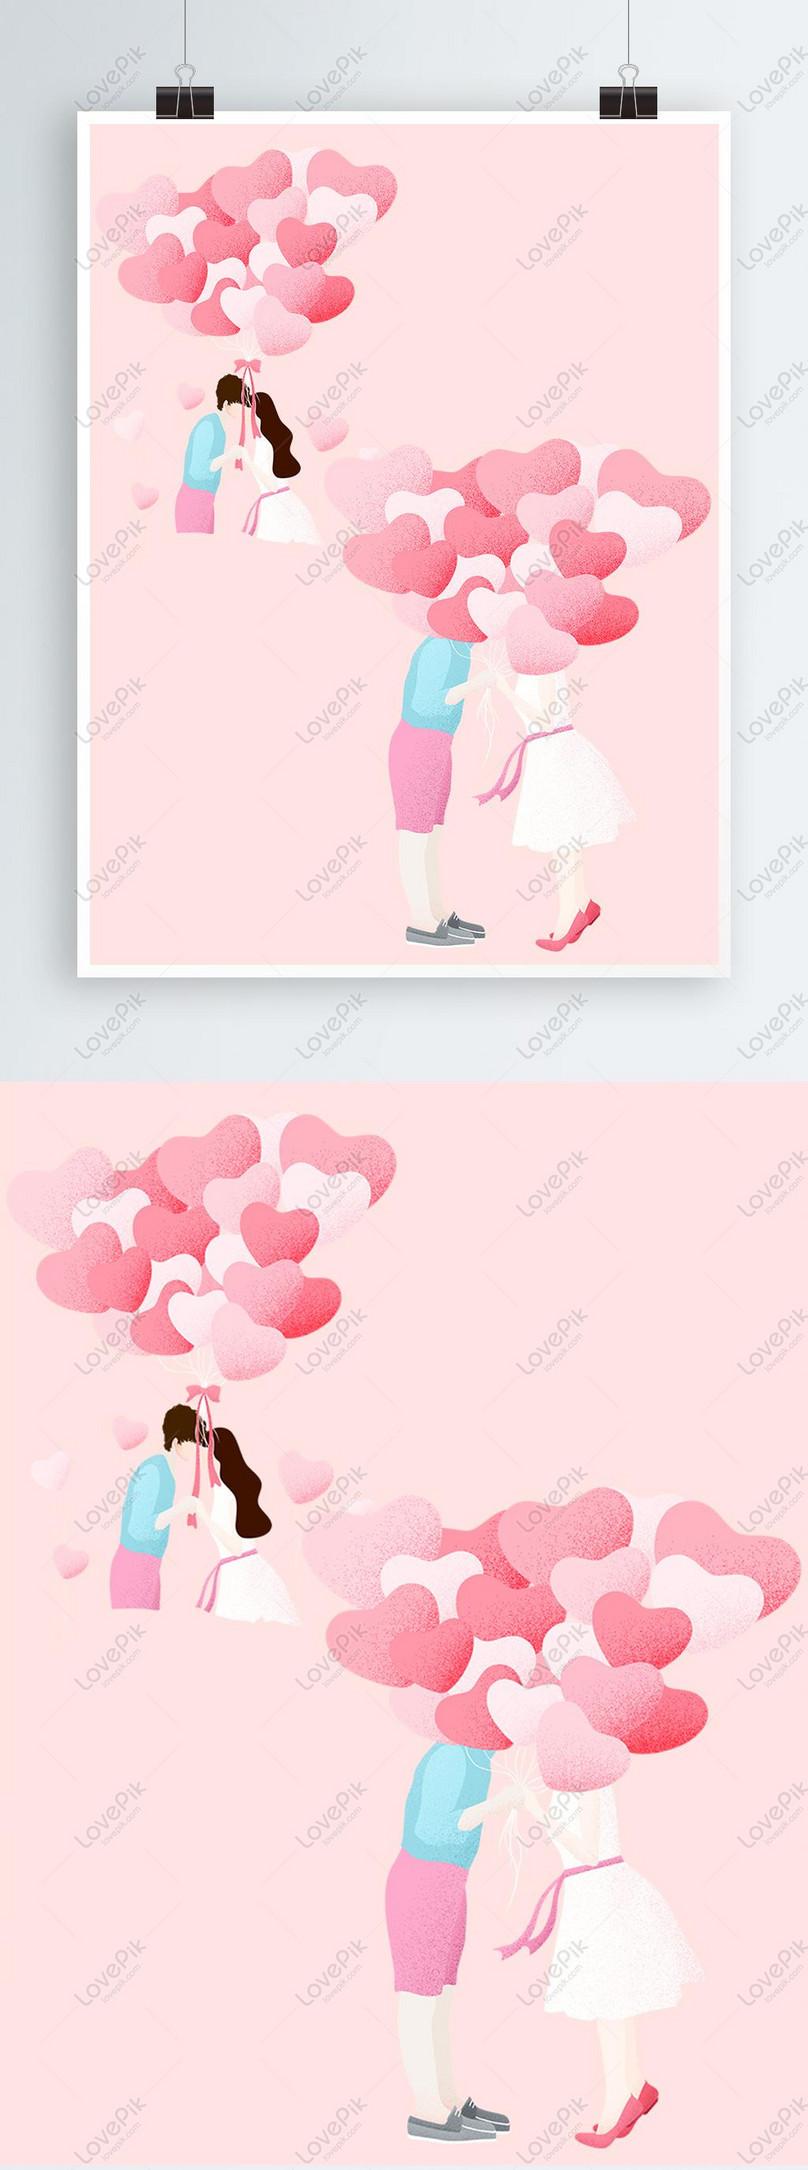 Tangan Memegang Belon Cinta Lukisan Valentine Romantis Gambar